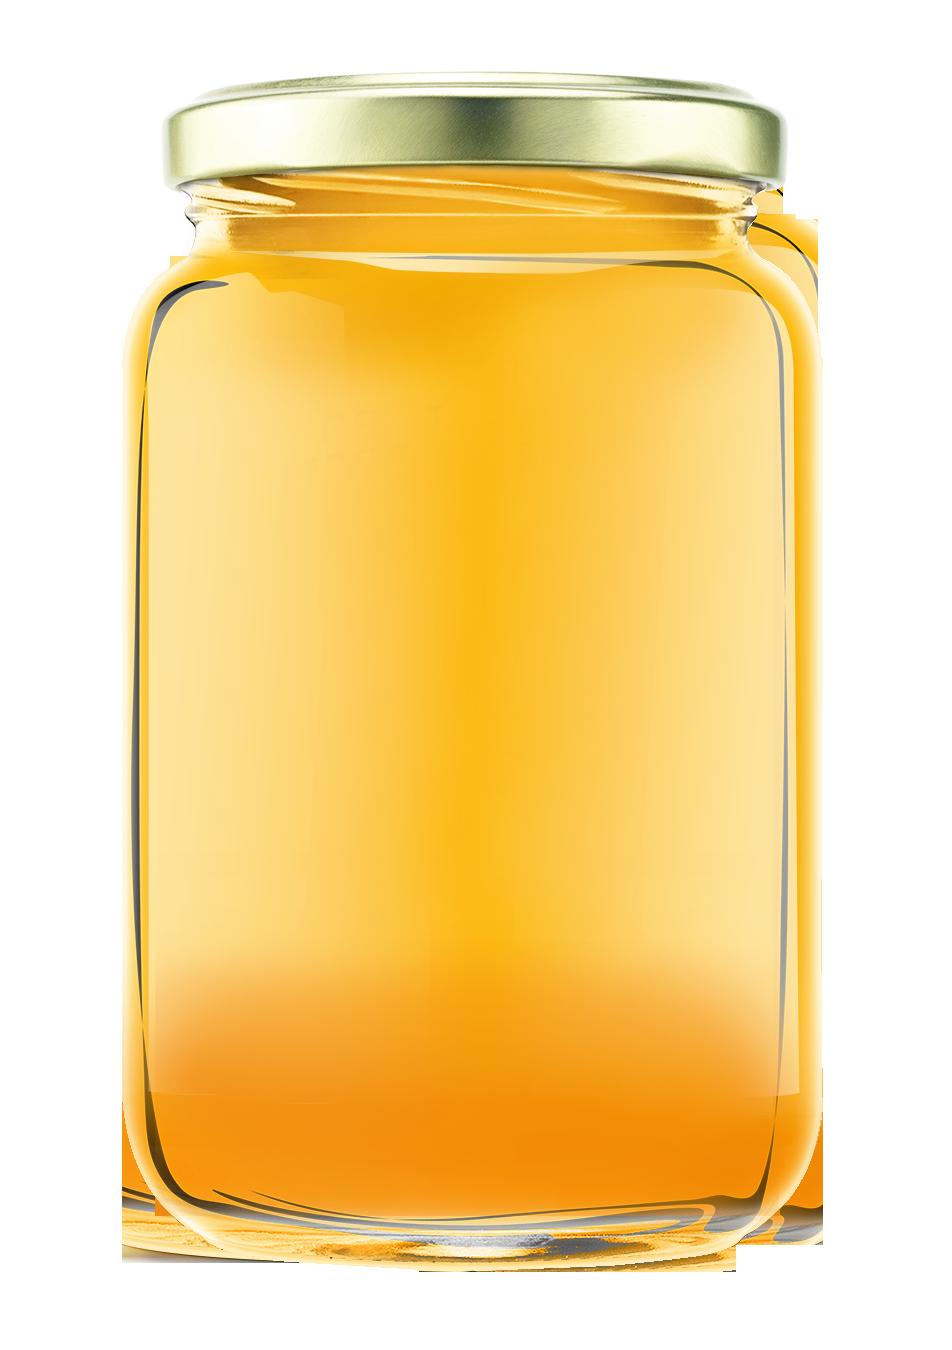 Honey png image purepng. Oil clipart jar